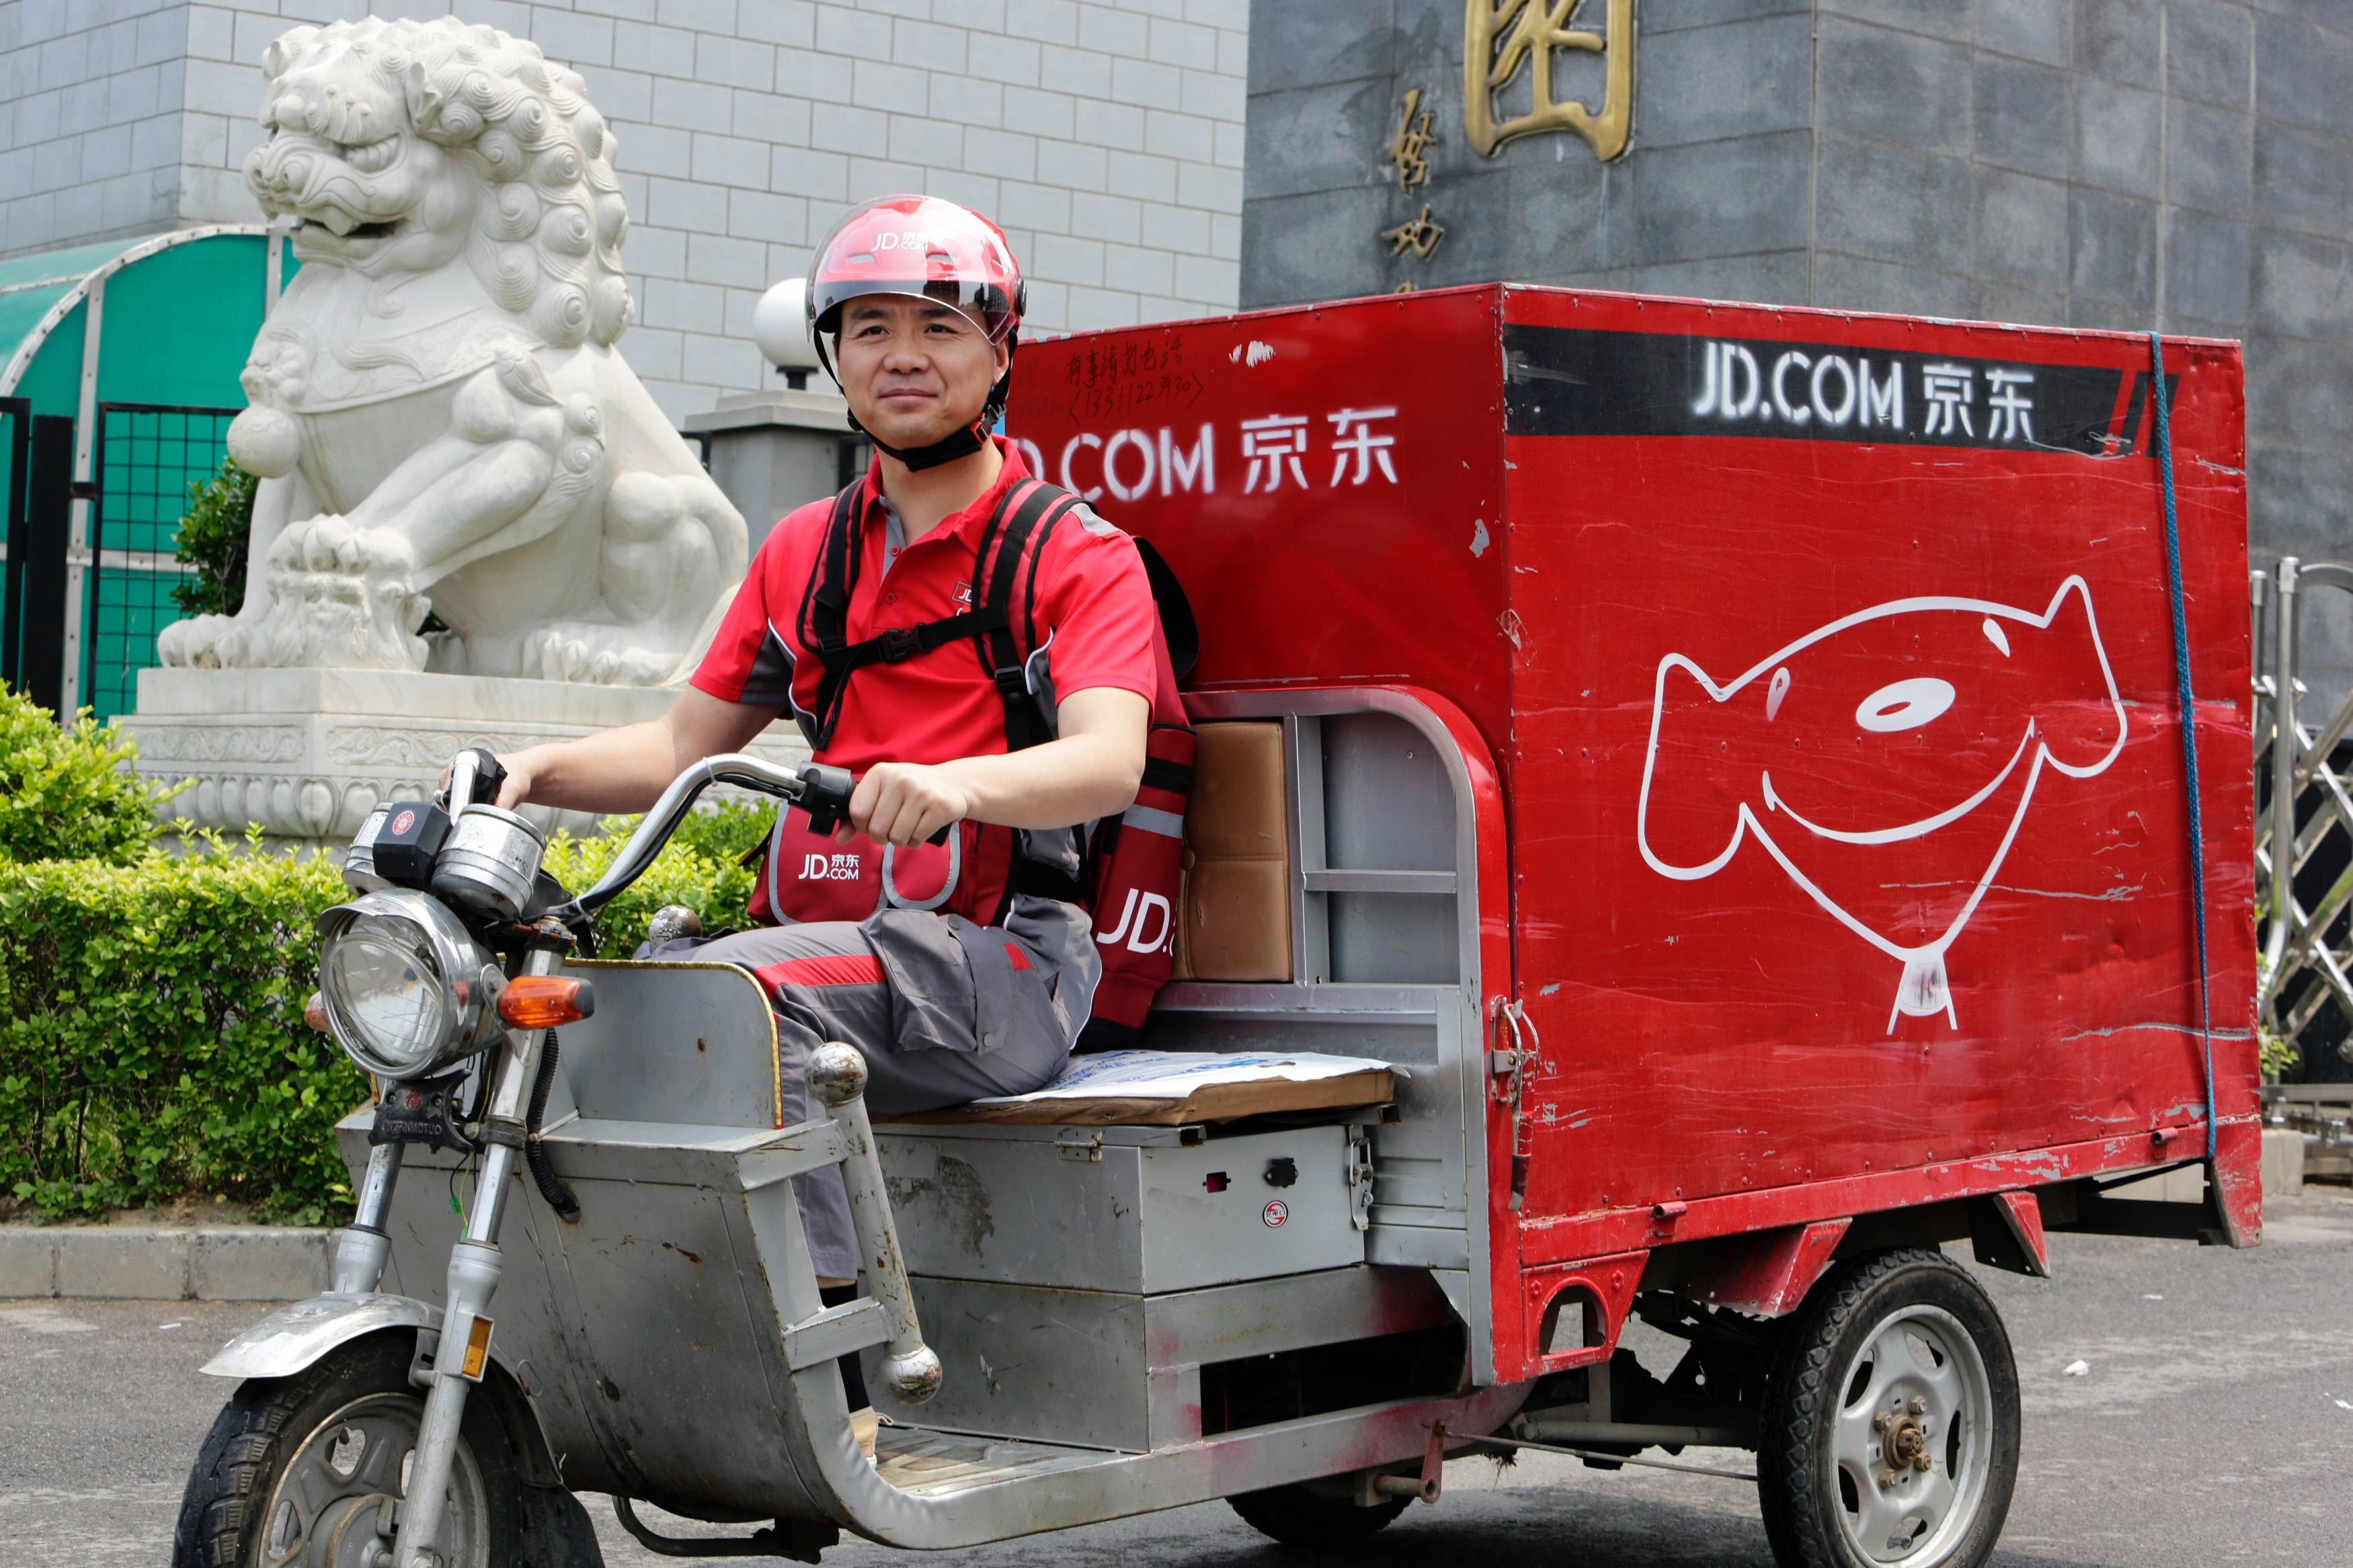 JD.com delivery | Source: Reuters